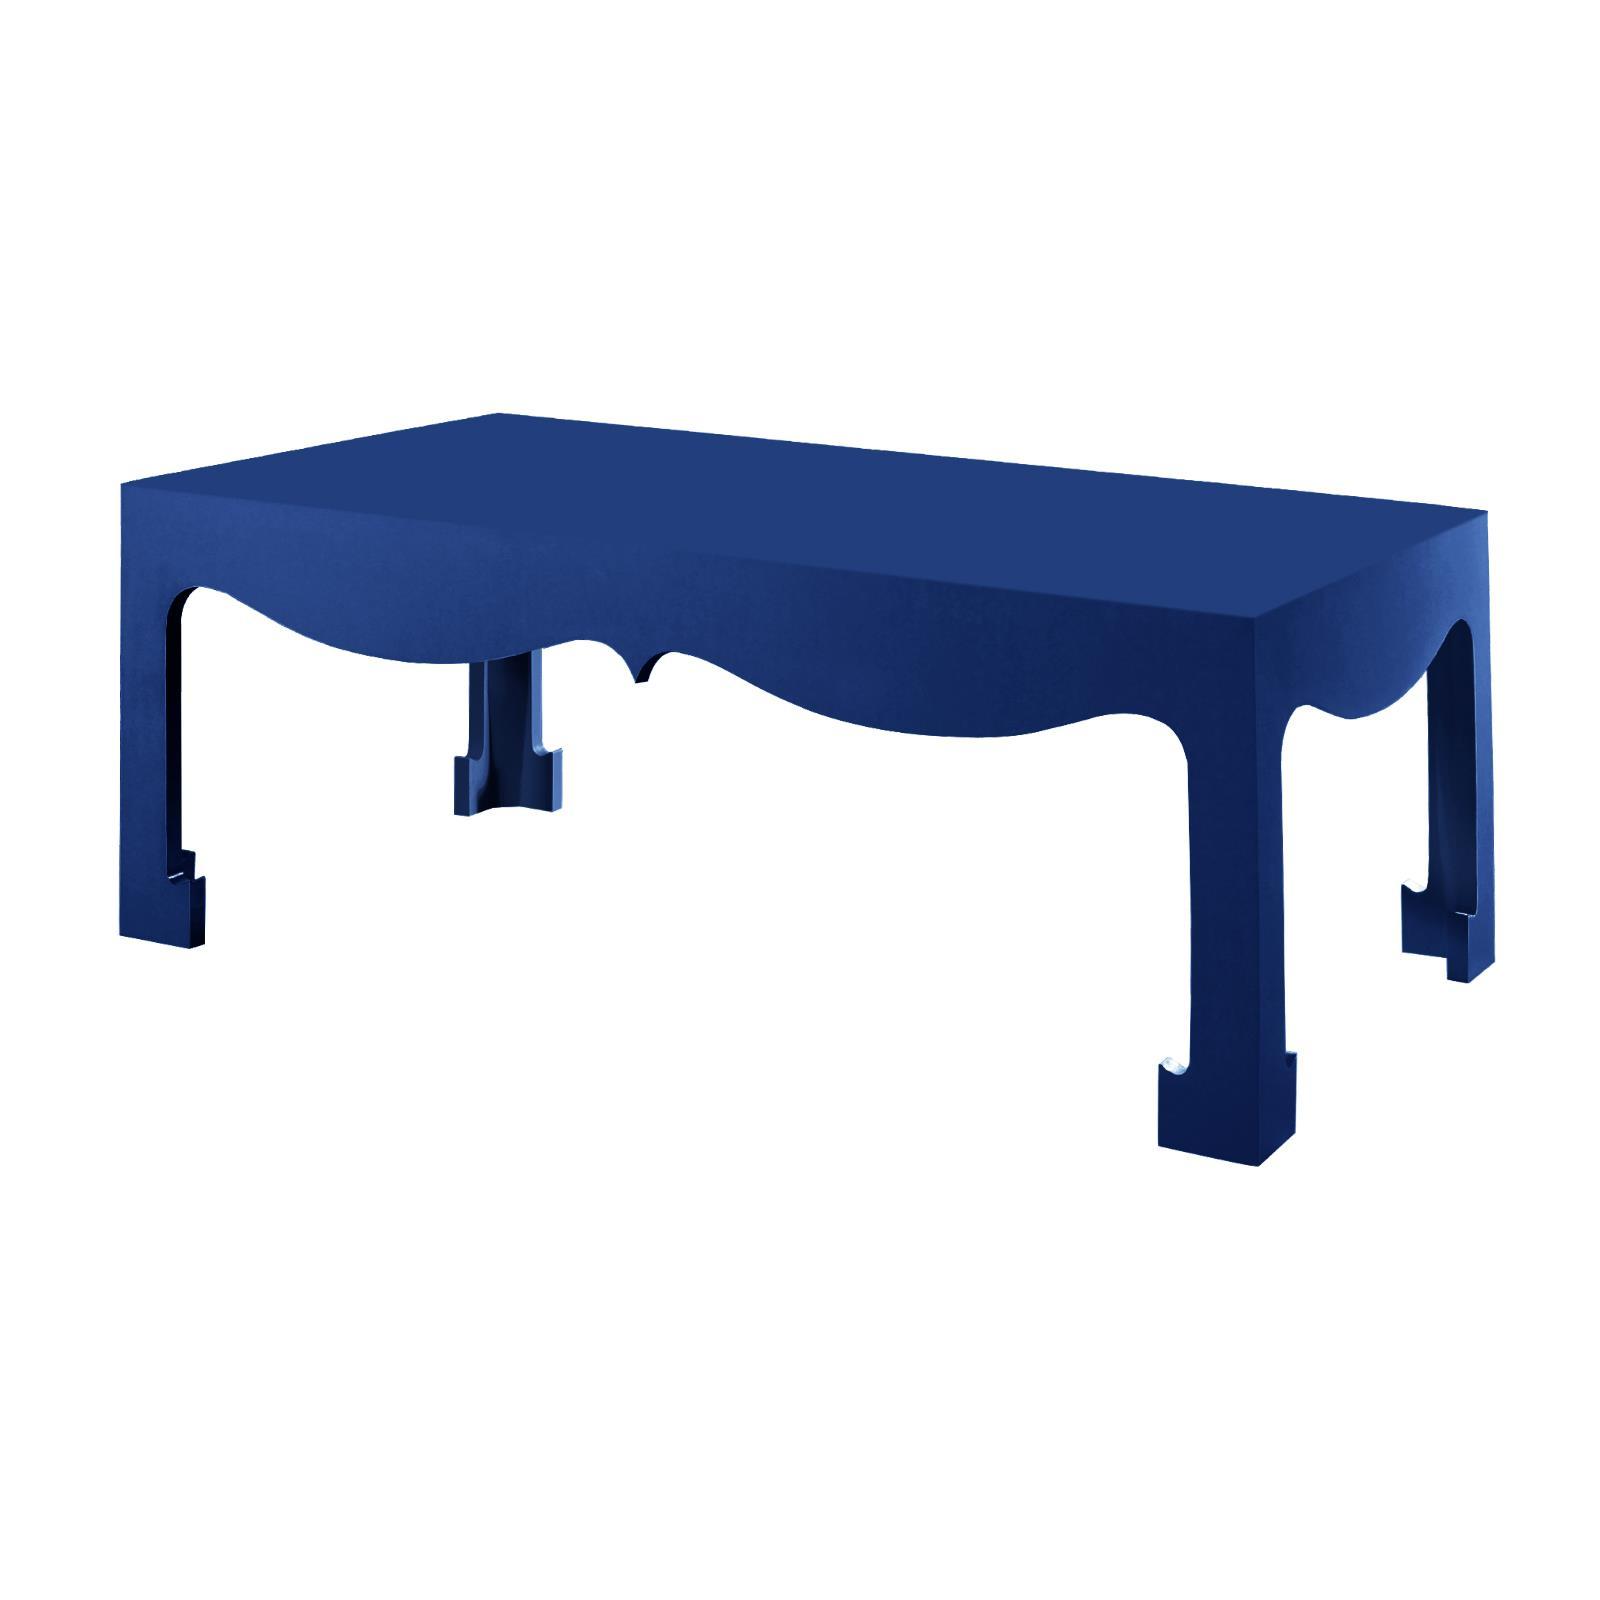 Jordan Coffee Table, Navy Blue